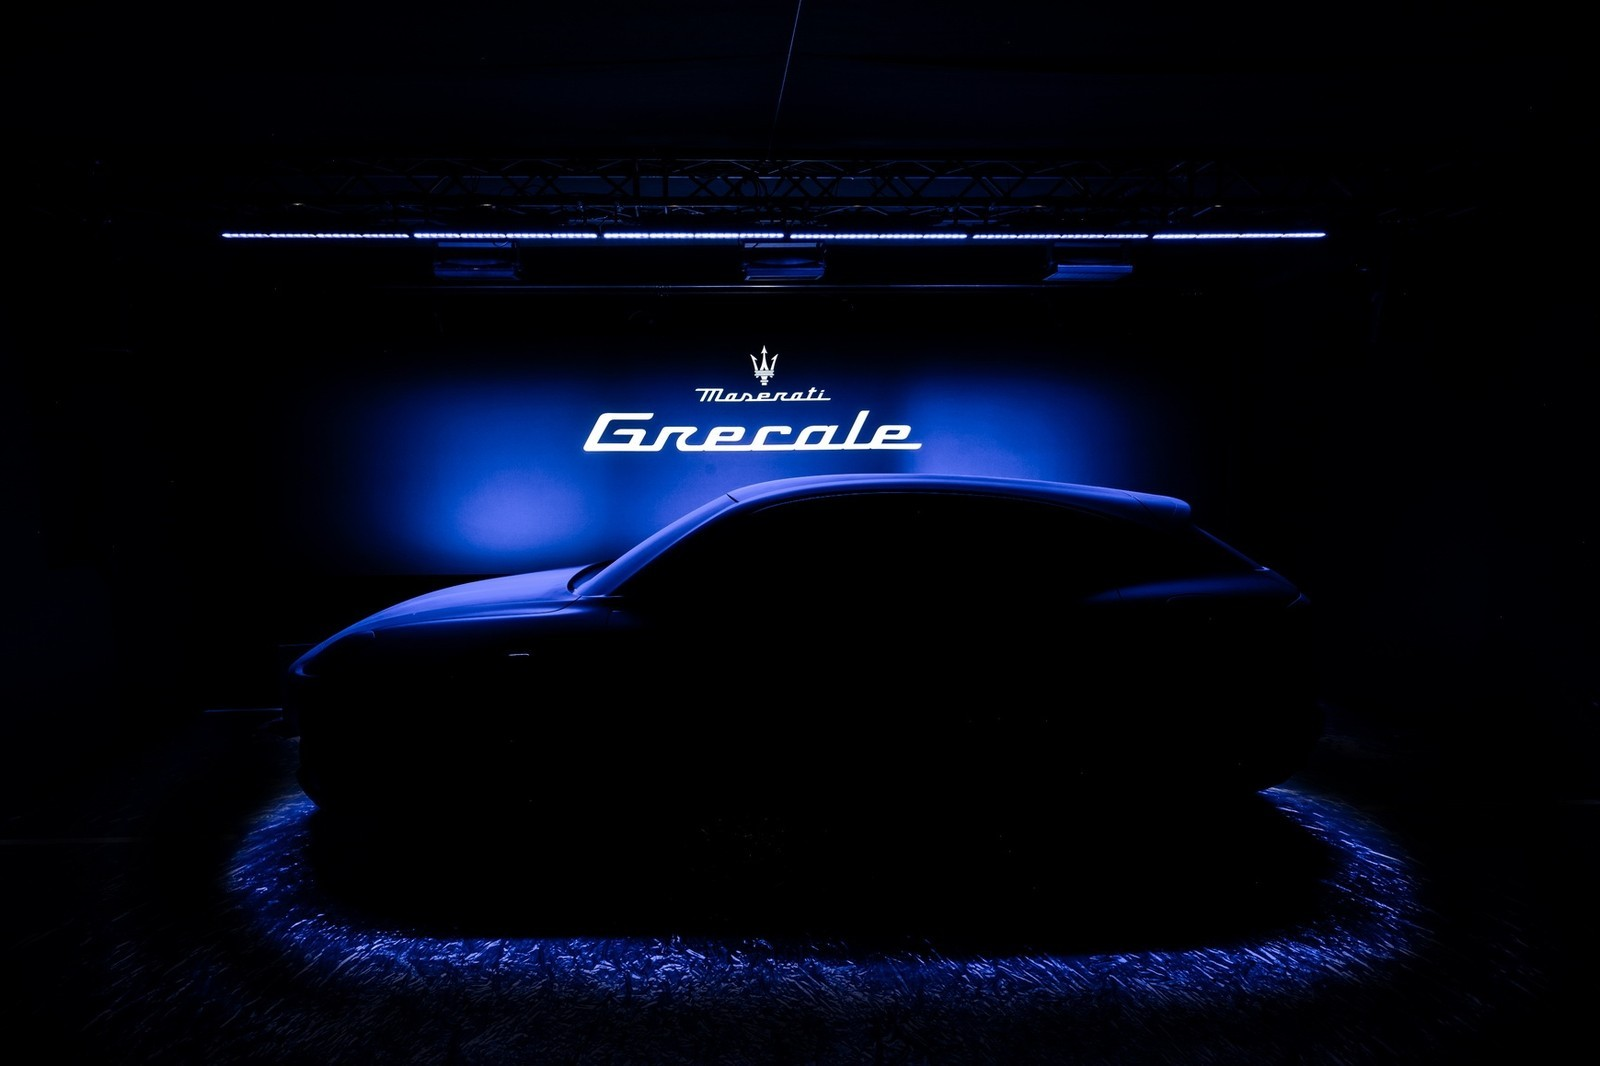 Maserati мечет «молнии»: анонсированы кроссовер Grecale и другие новинки